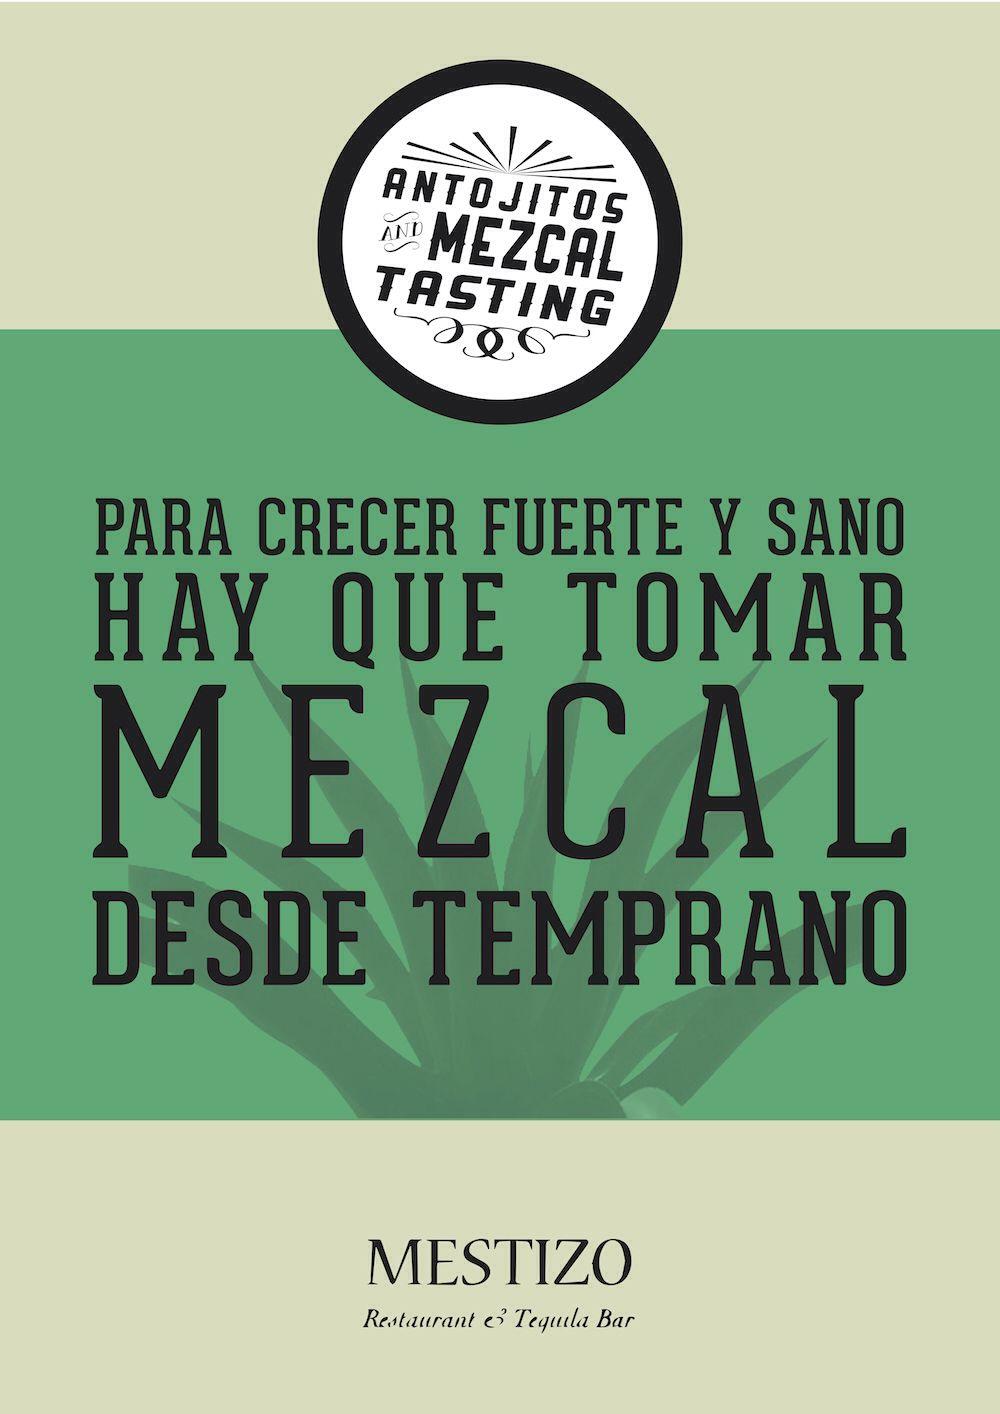 El Armario Que Plancha ~ Mezcal ChEvEcHIta, MeZcAliTo, PulQuE, TeqUiLa Pinterest Mezcal, Frases y Mexicanos